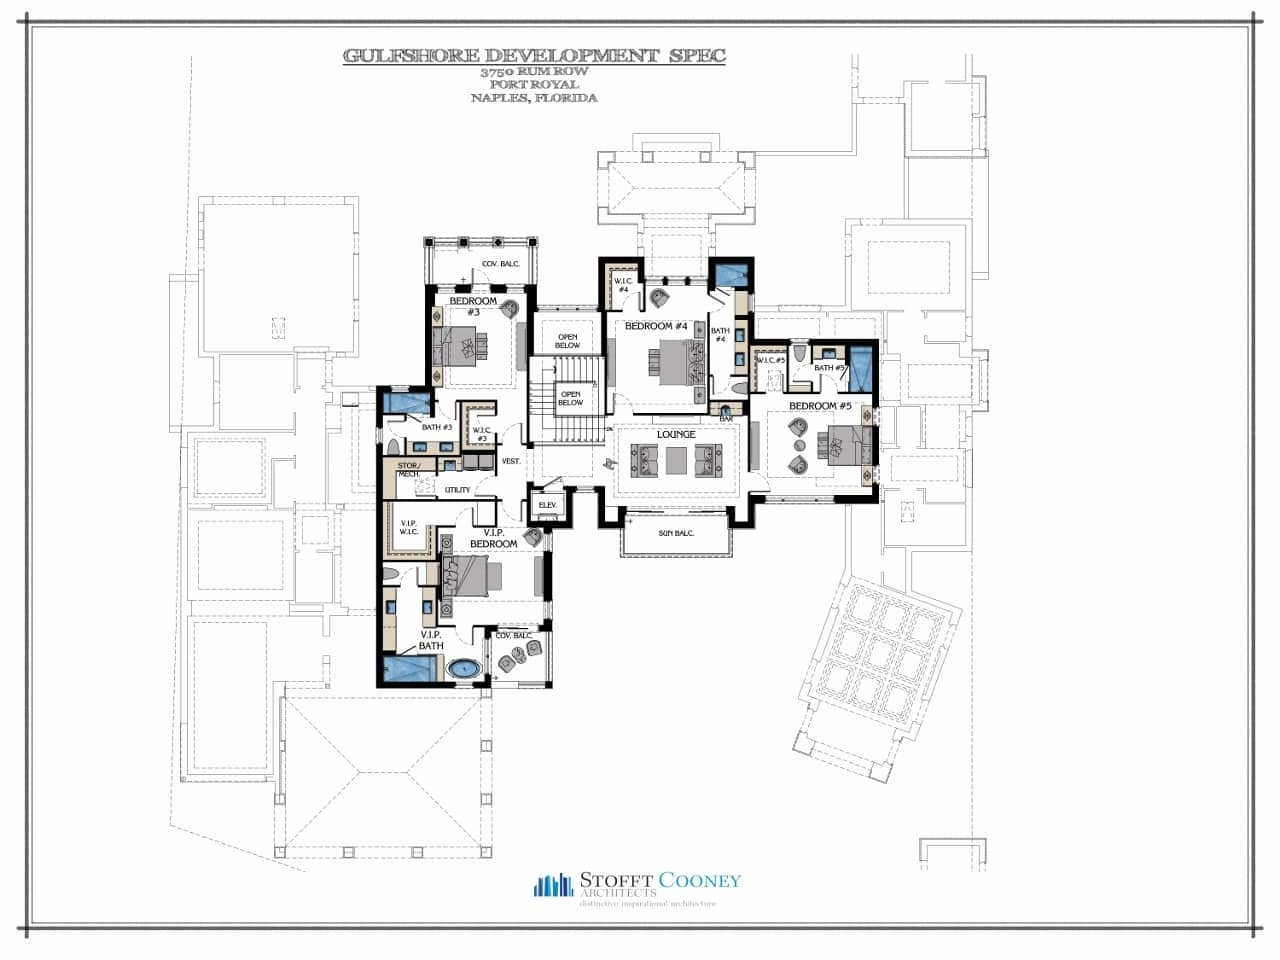 Upstairs Floor Plan - 3750 Rum Row, Naples